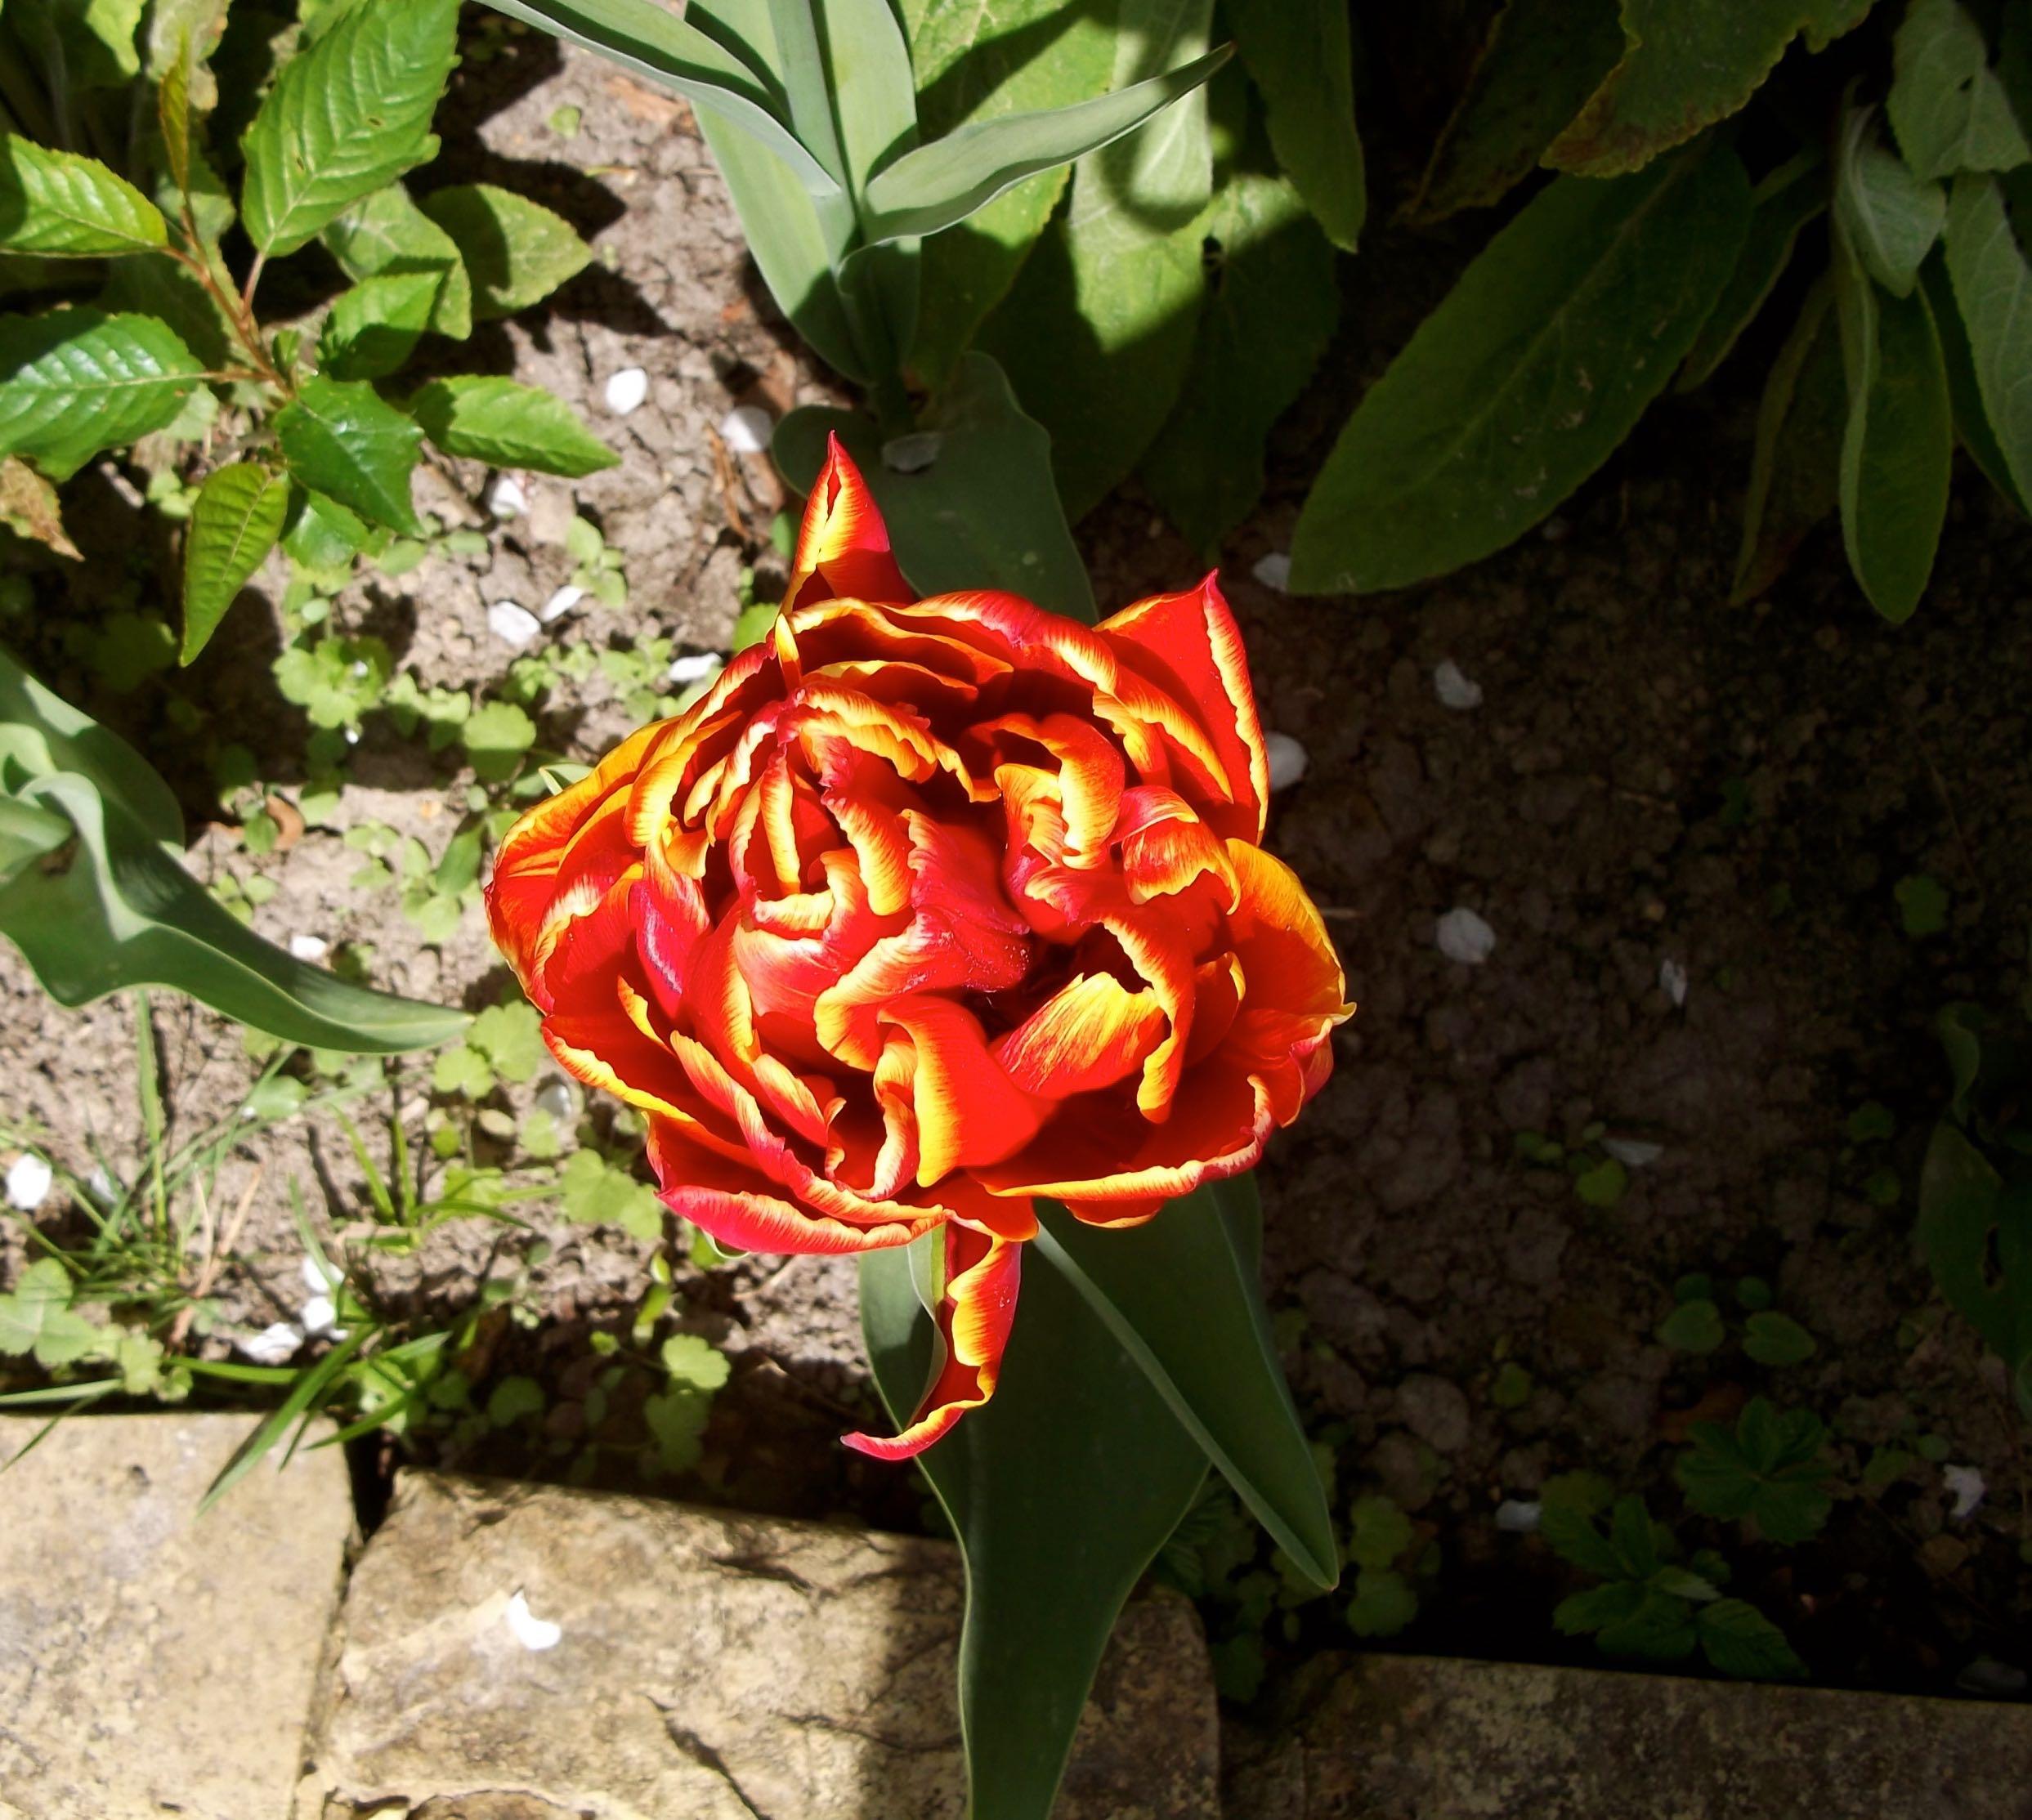 standen_tulip_festival2.jpg